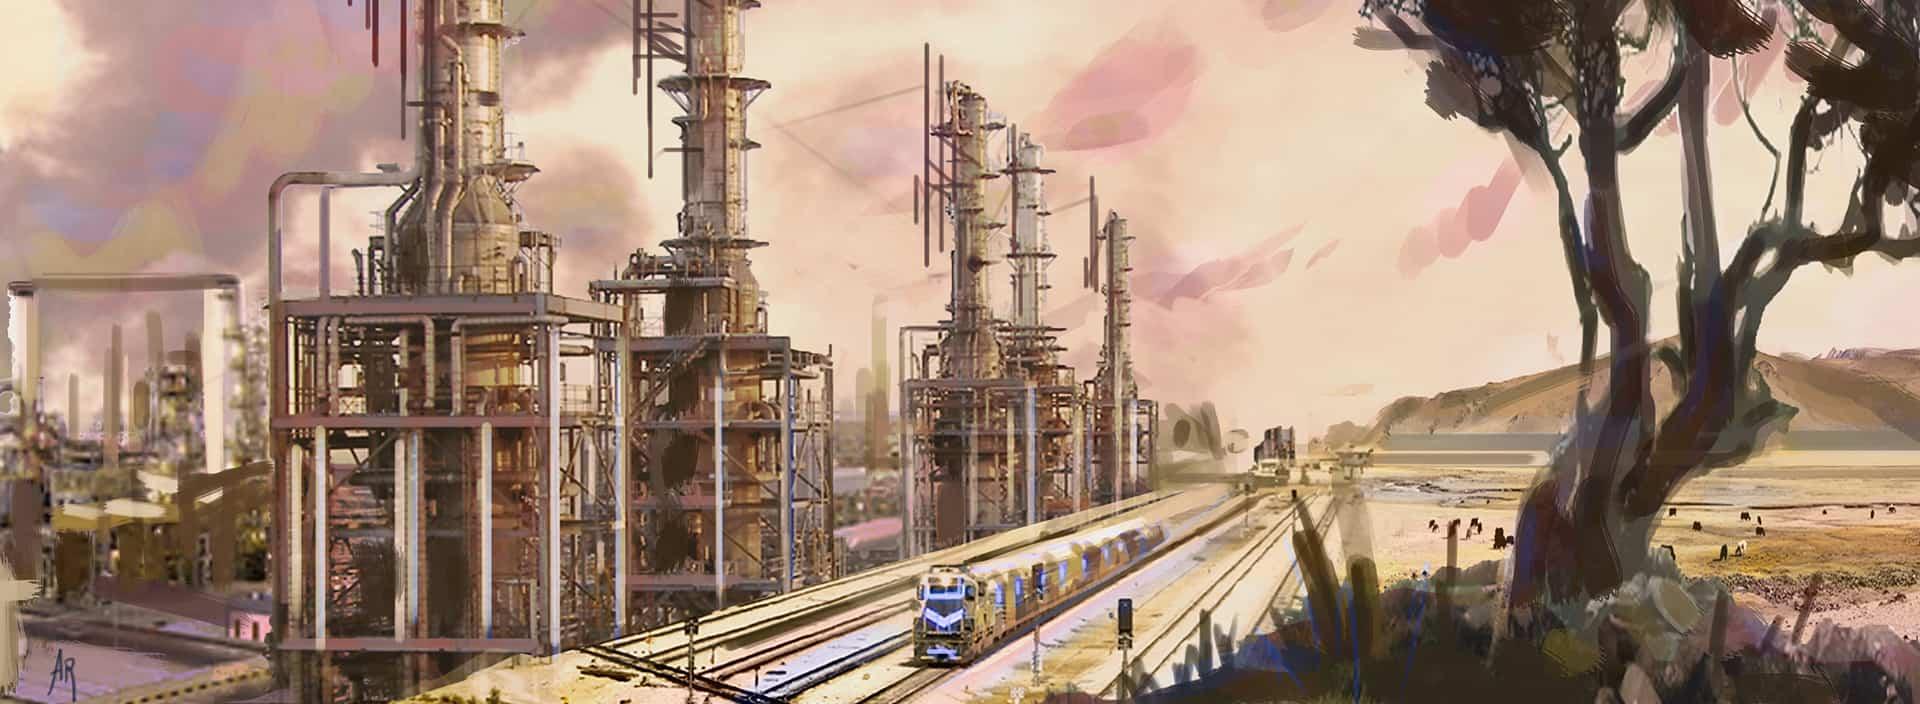 anna ramseier, oil refinery